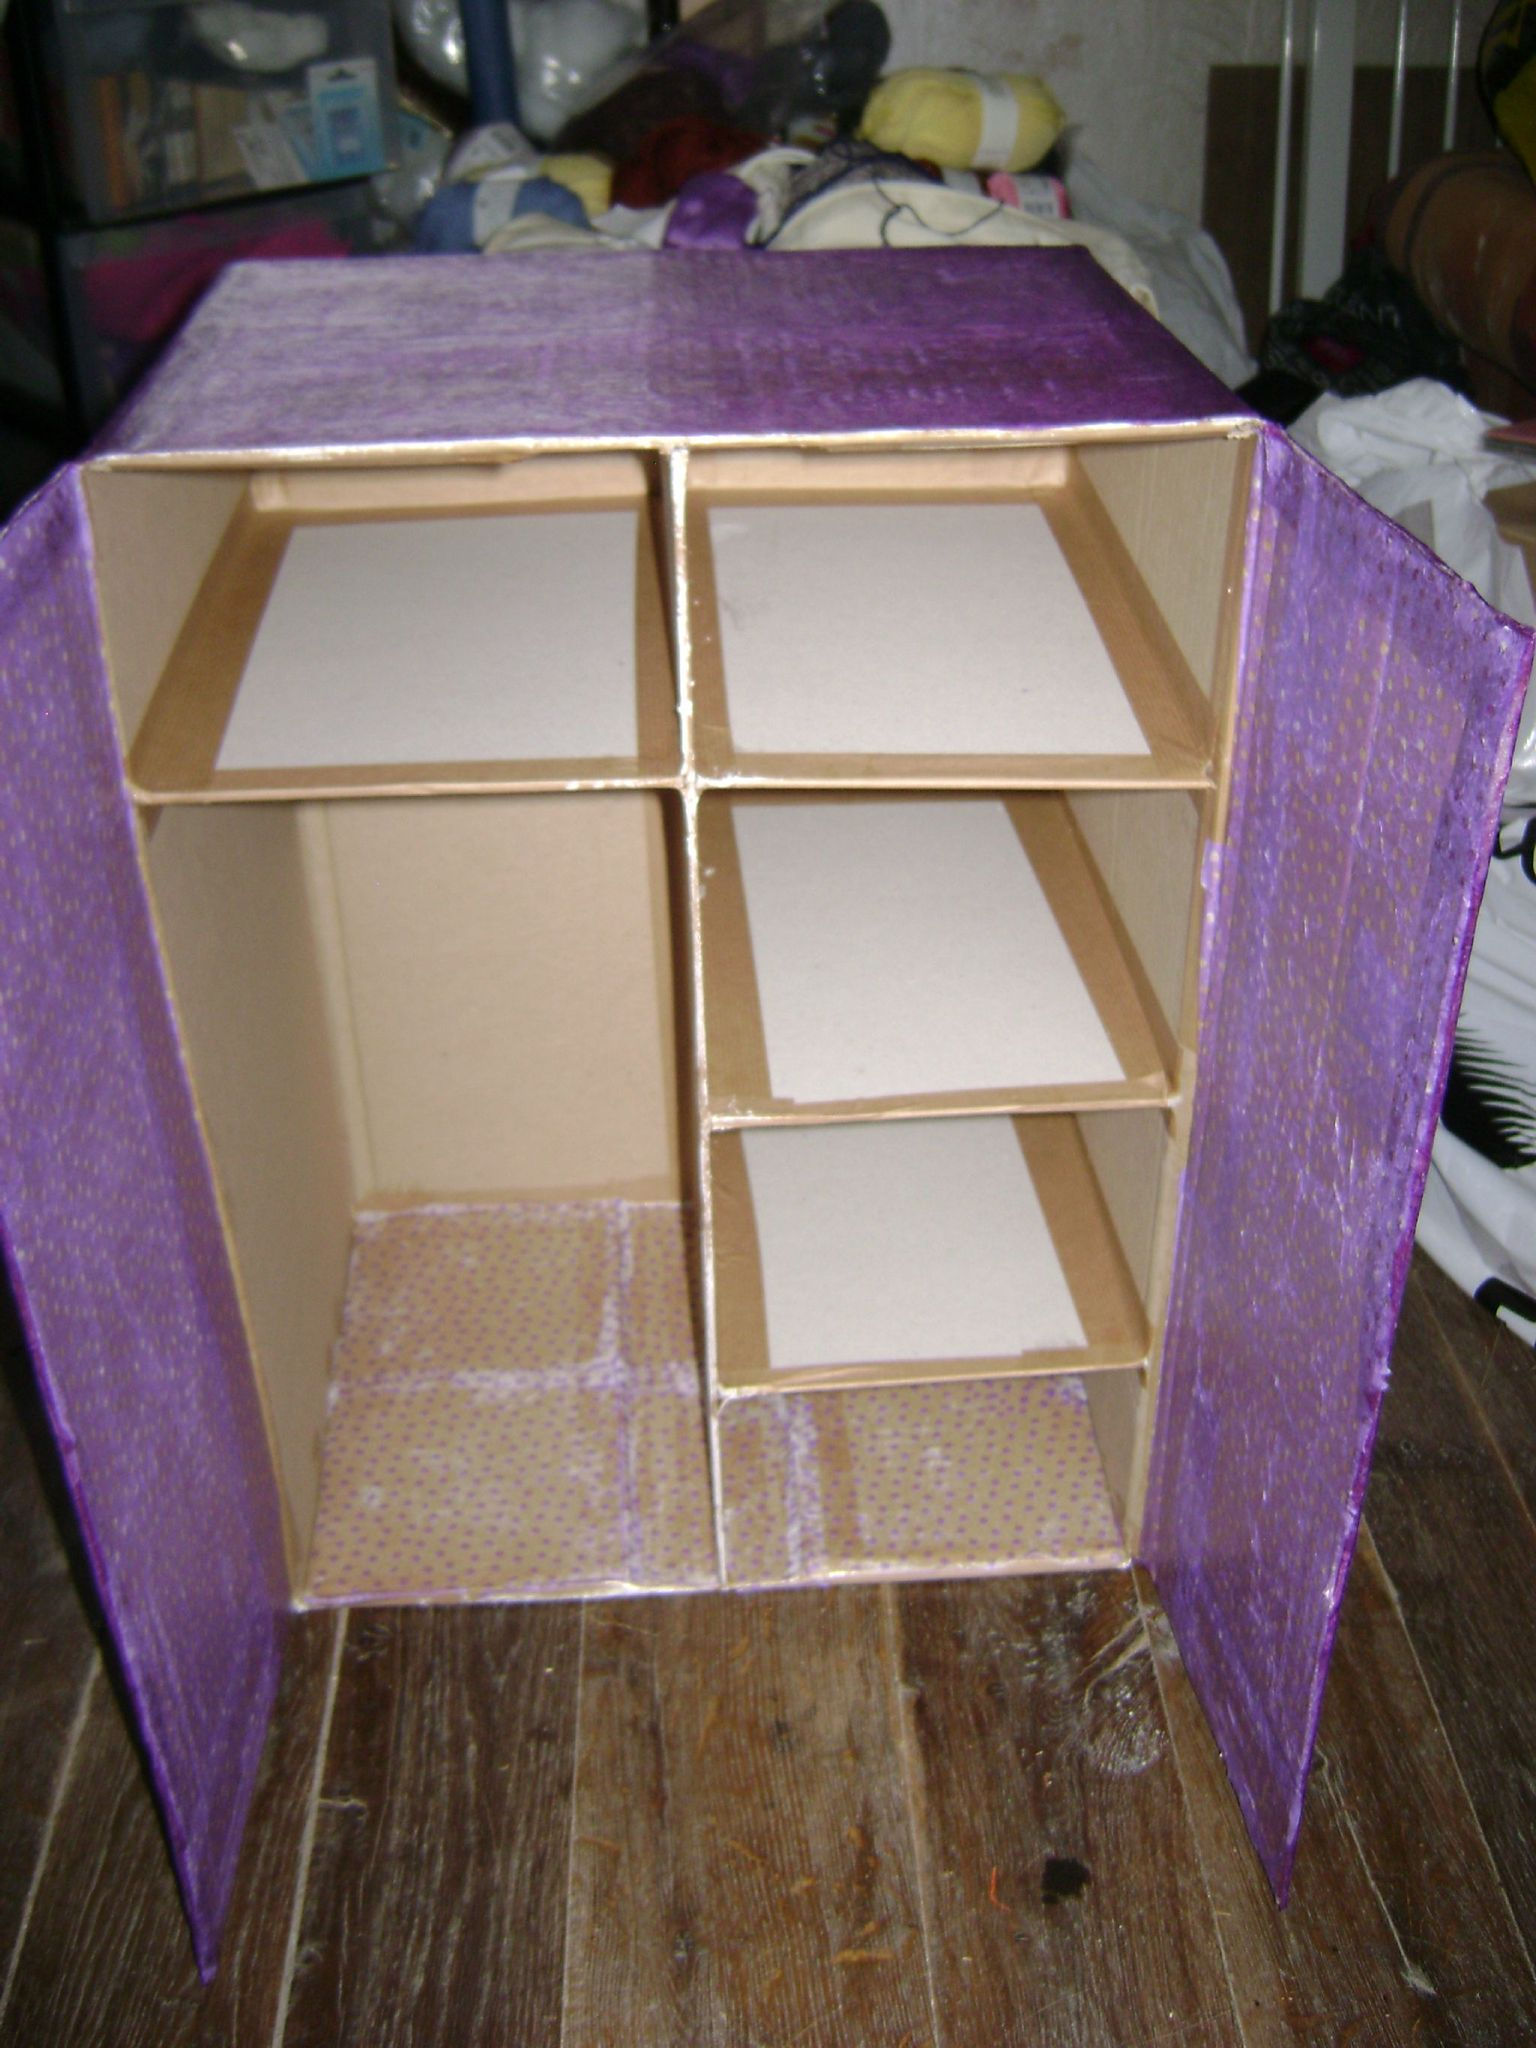 Шкаф из картона игрушечный